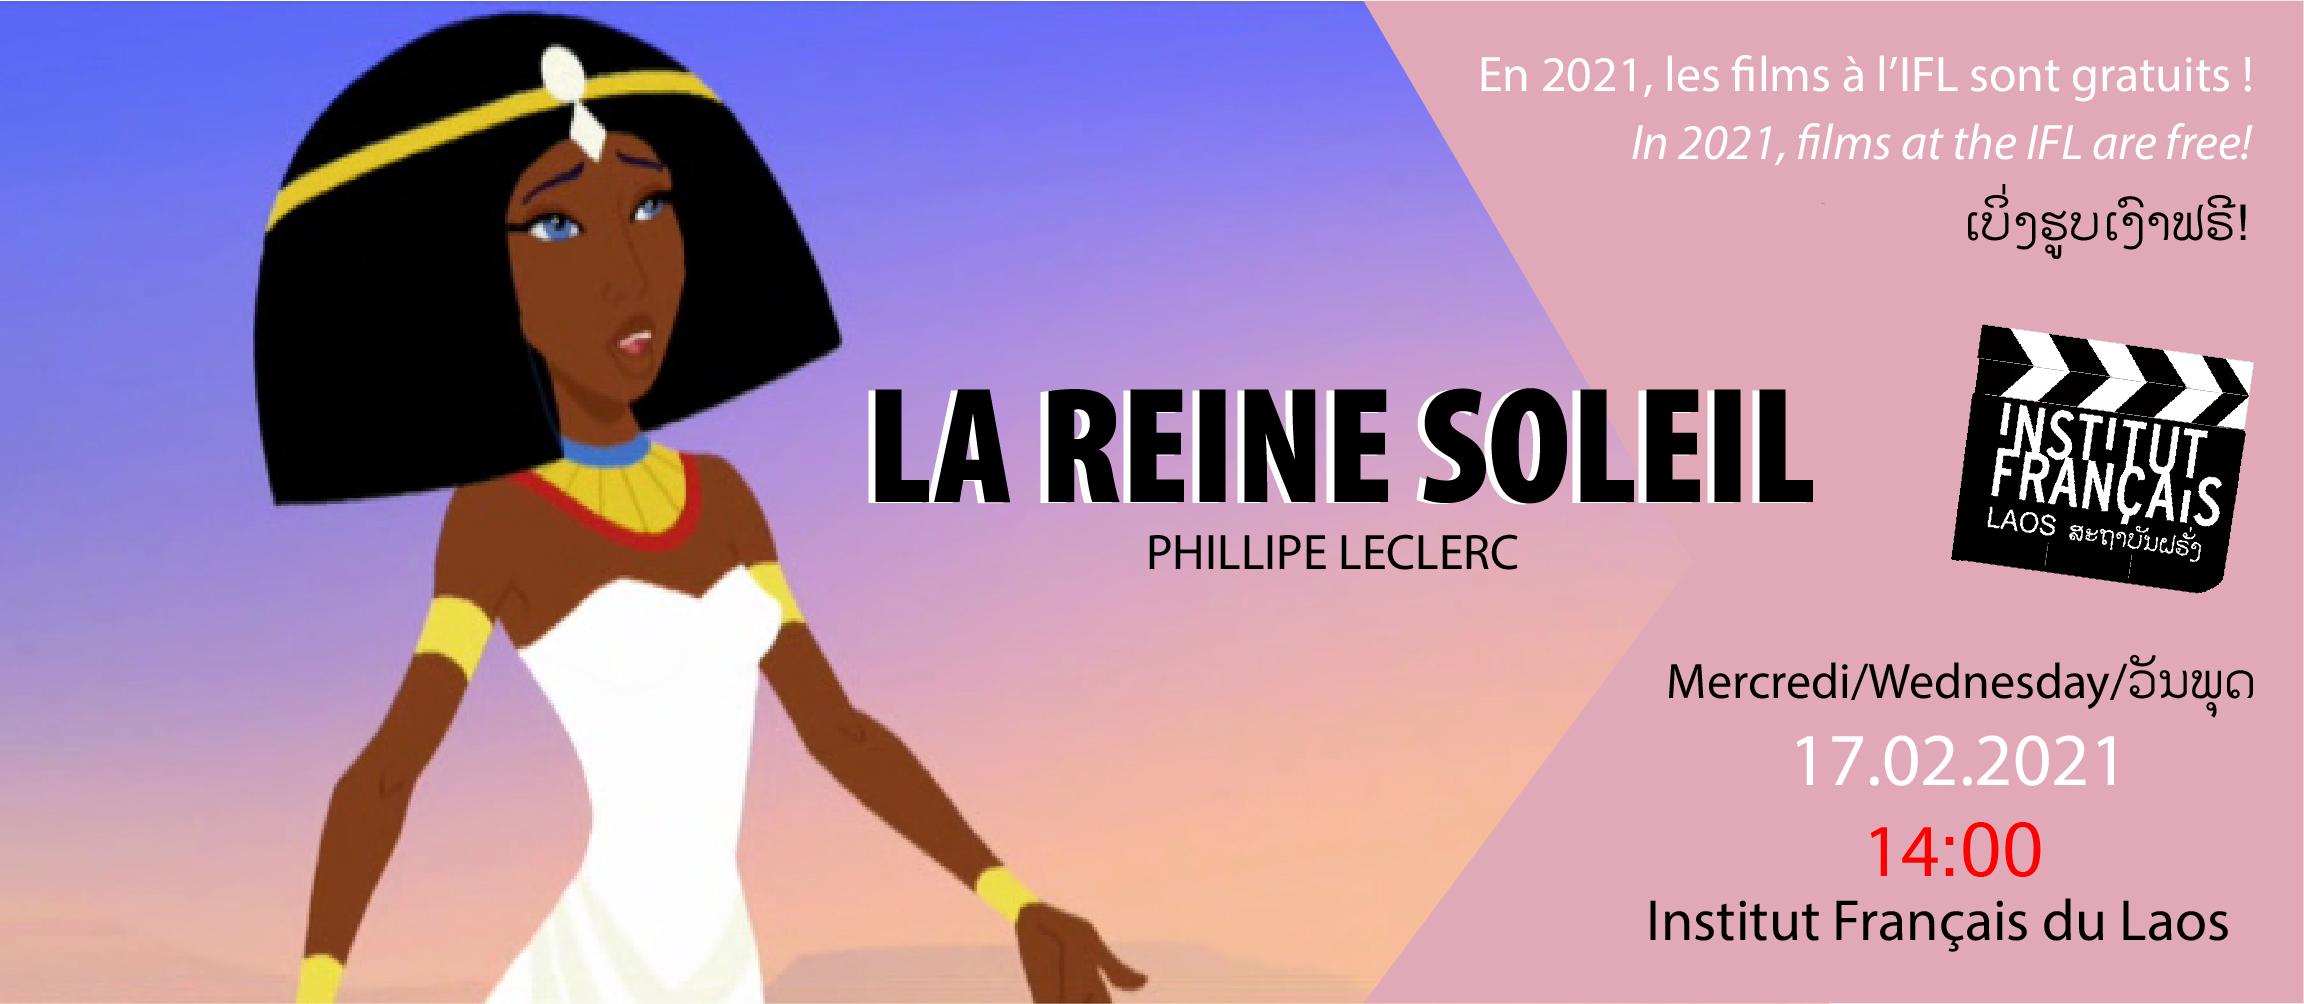 FILM ENFANTS // LA REINE SOLEIL